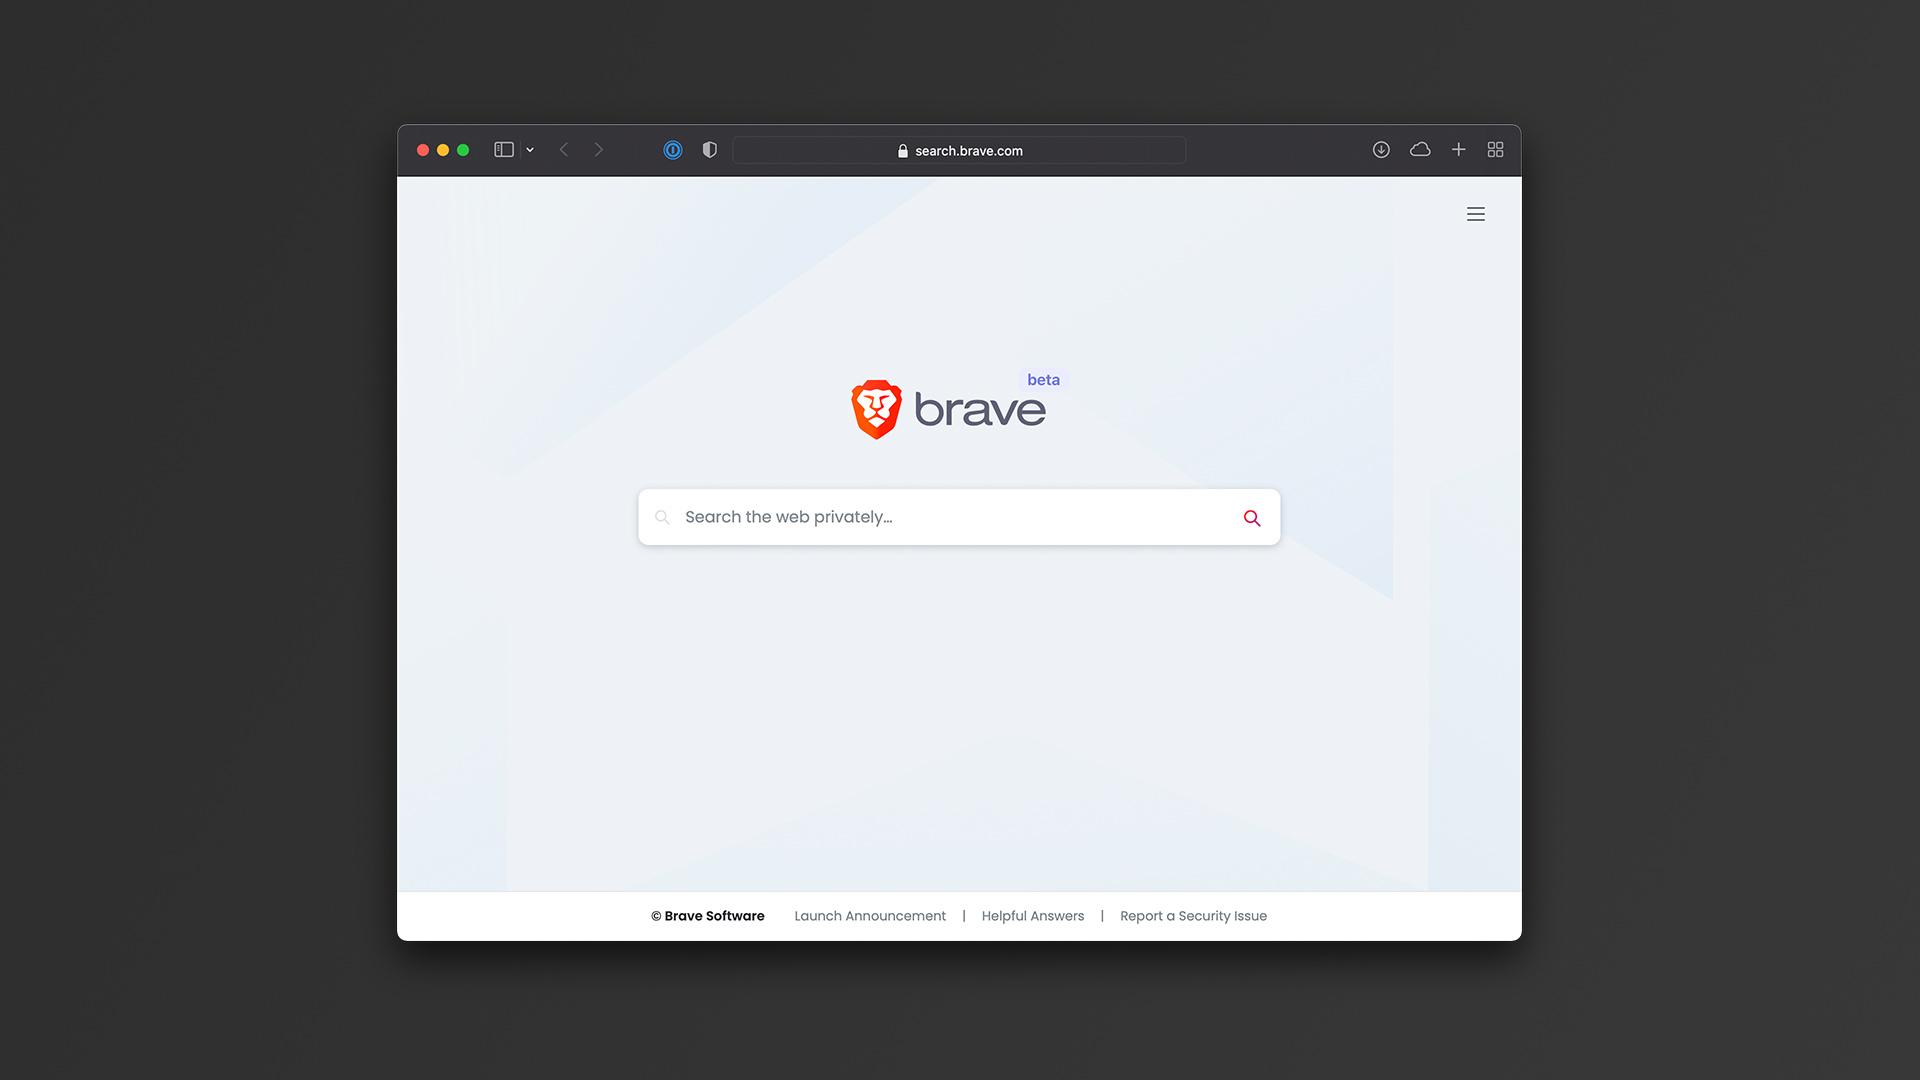 Brave Search: Και όμως... υπάρχει μηχανή αναζήτησης χωρίς tracking